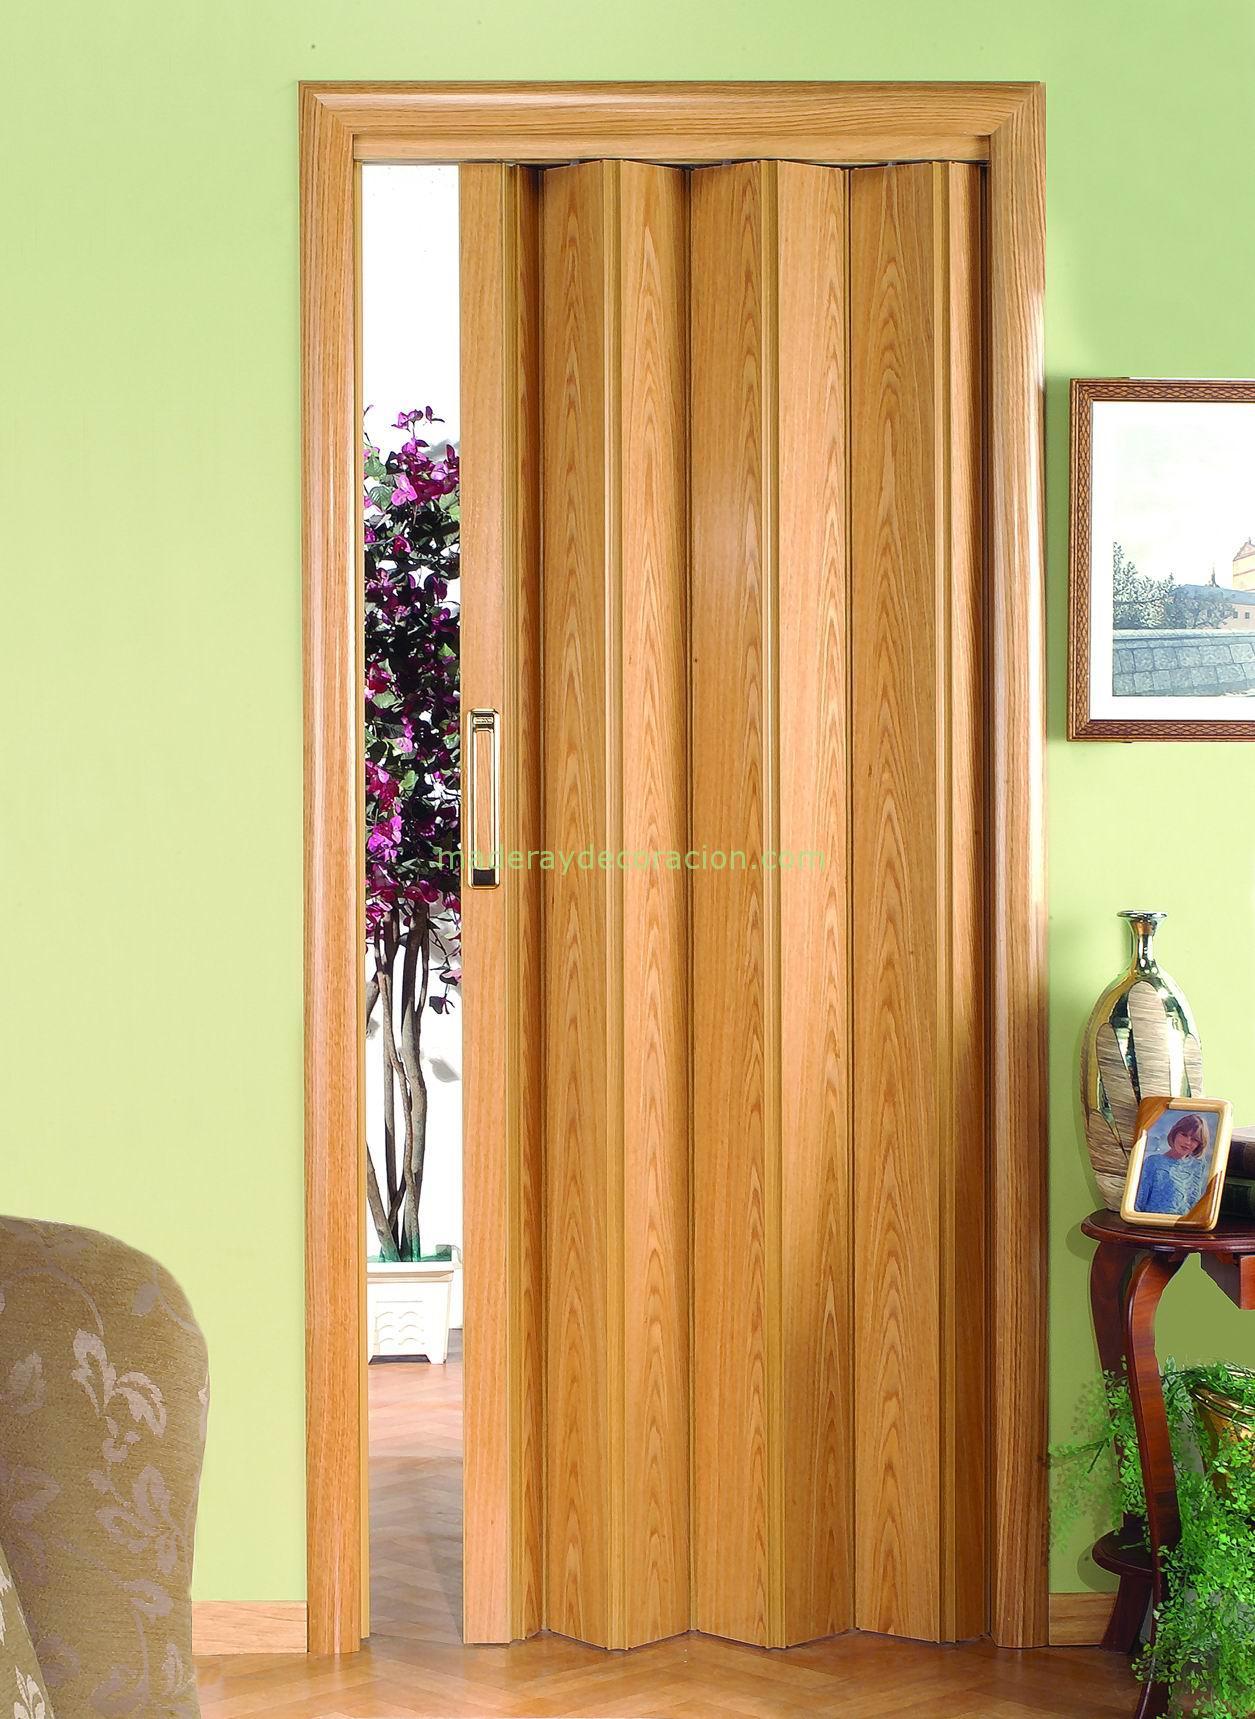 Puertas plegables a medida de madera y pvc - Puerta corredera plegable ...